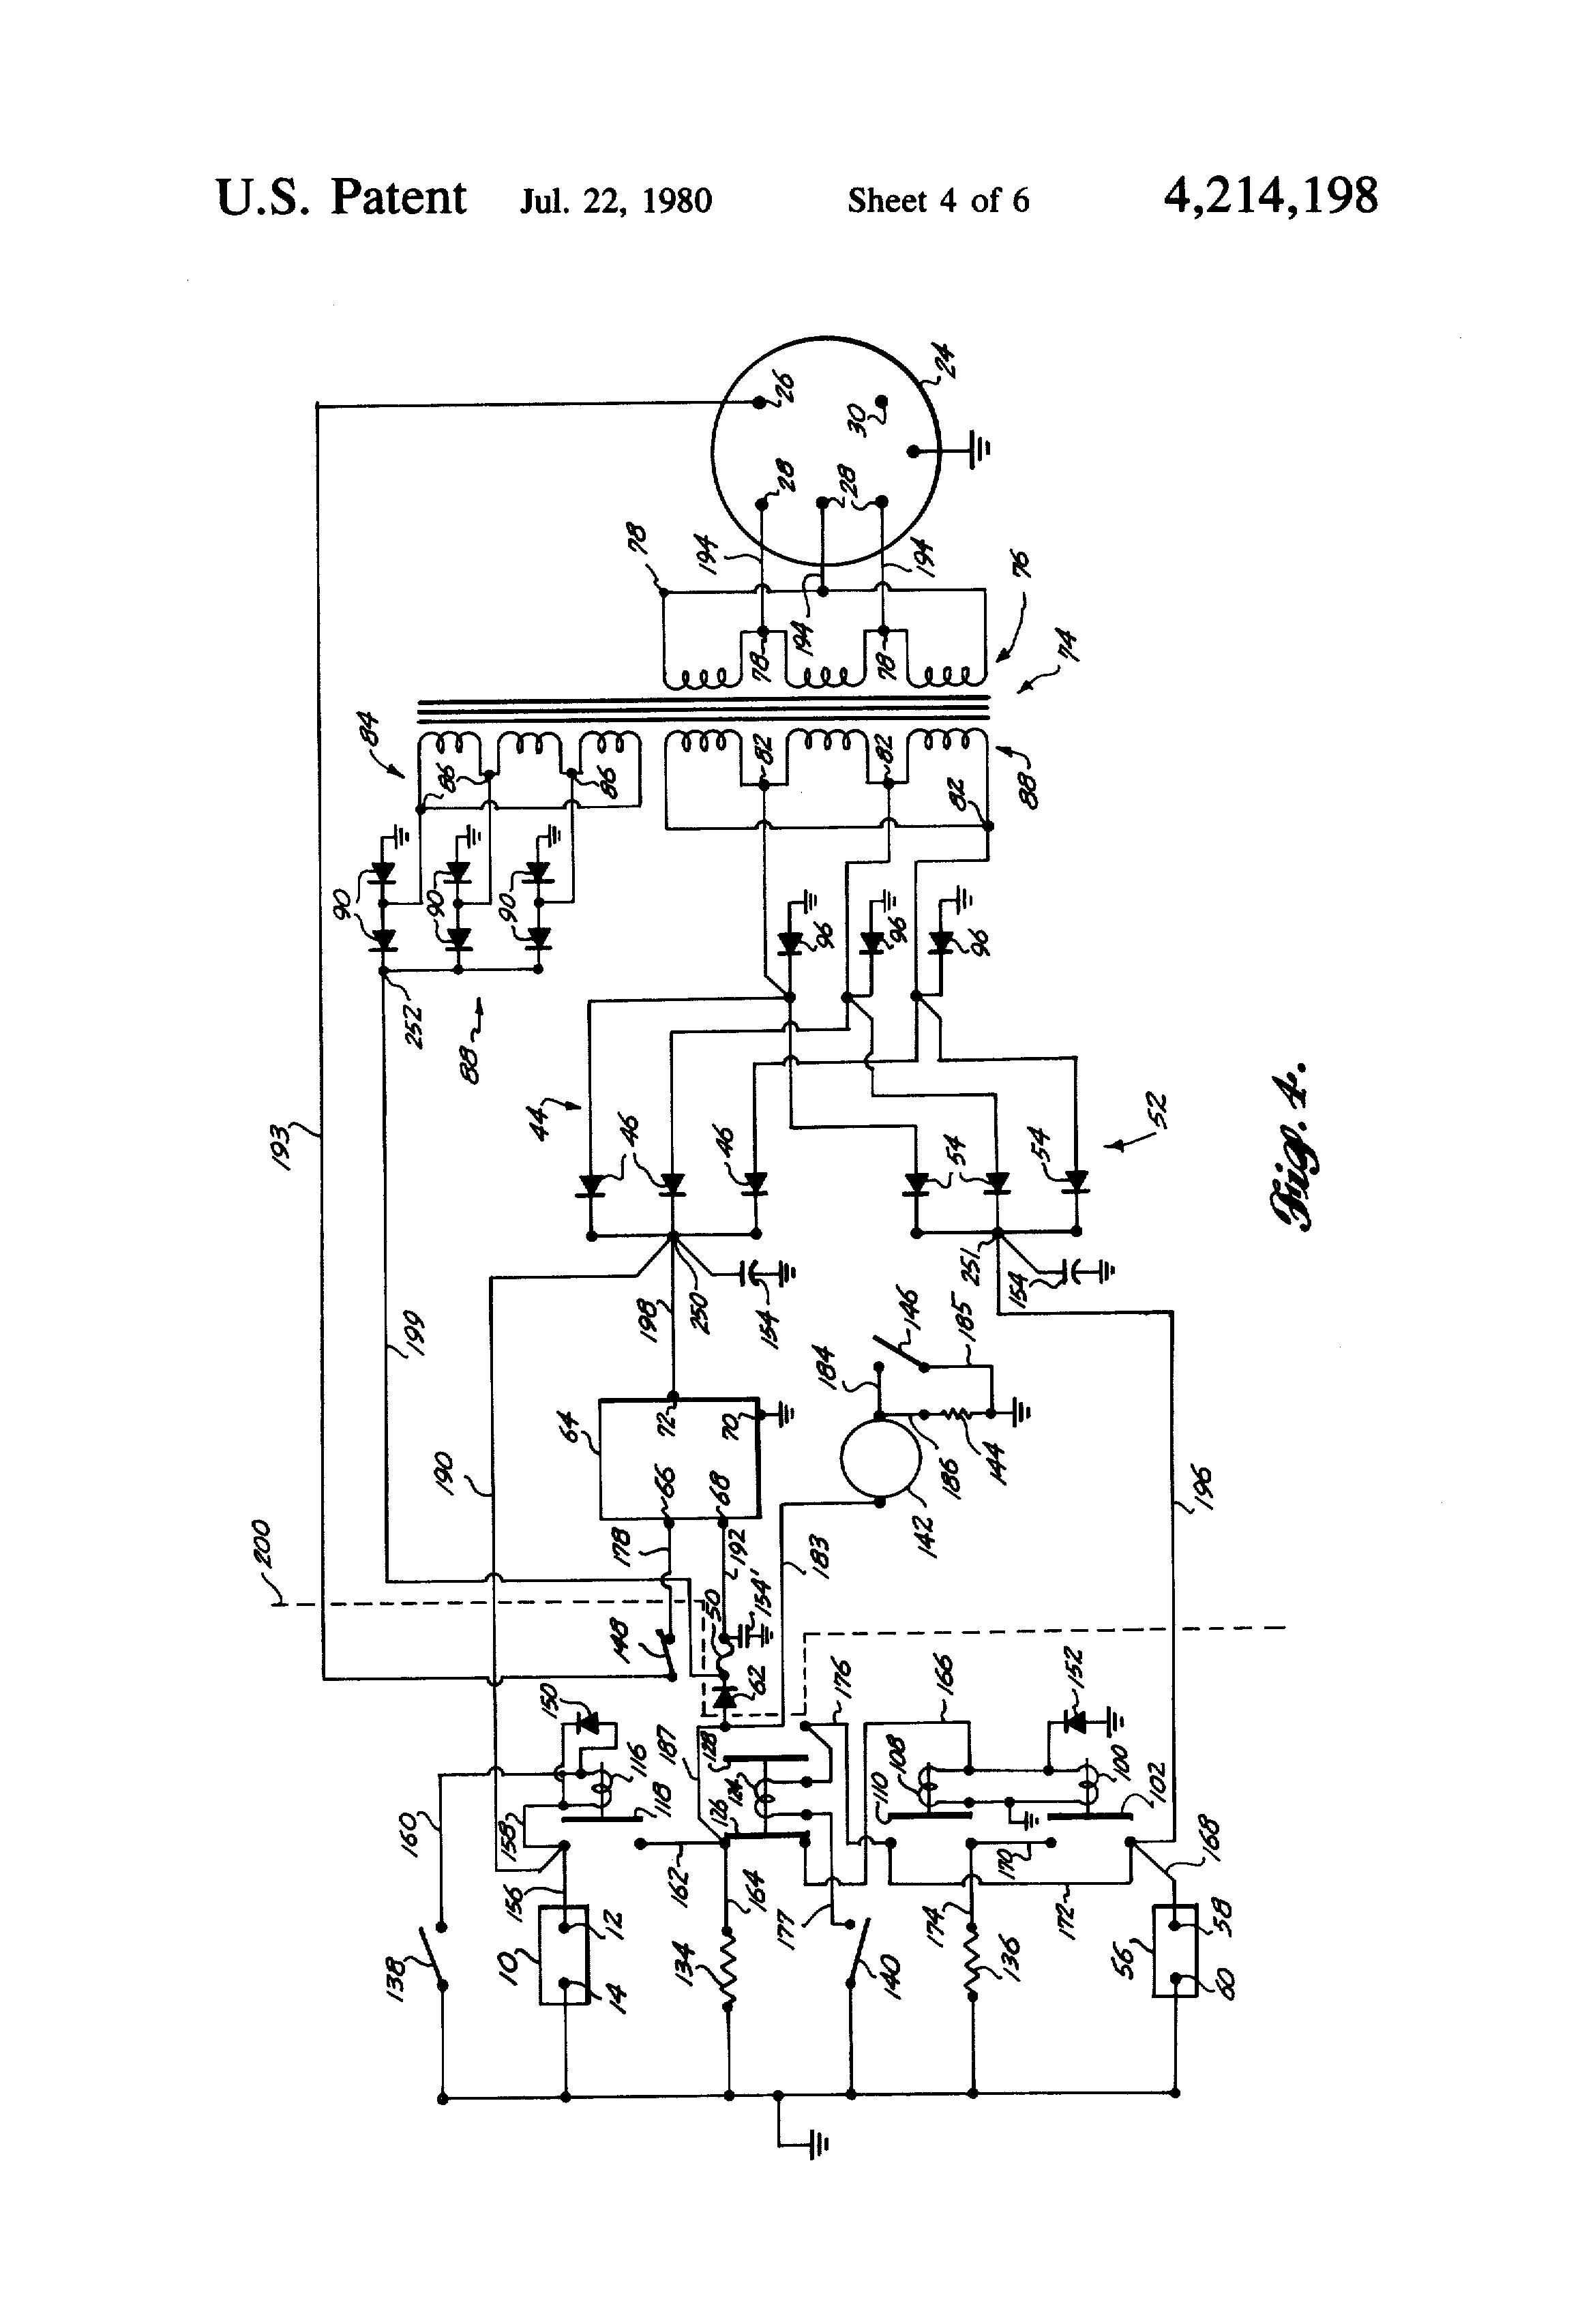 1996 club car wiring diagram 48 volt images wiring diagram club 48 volt club car 252 wiring diagramclubwiring harness diagram